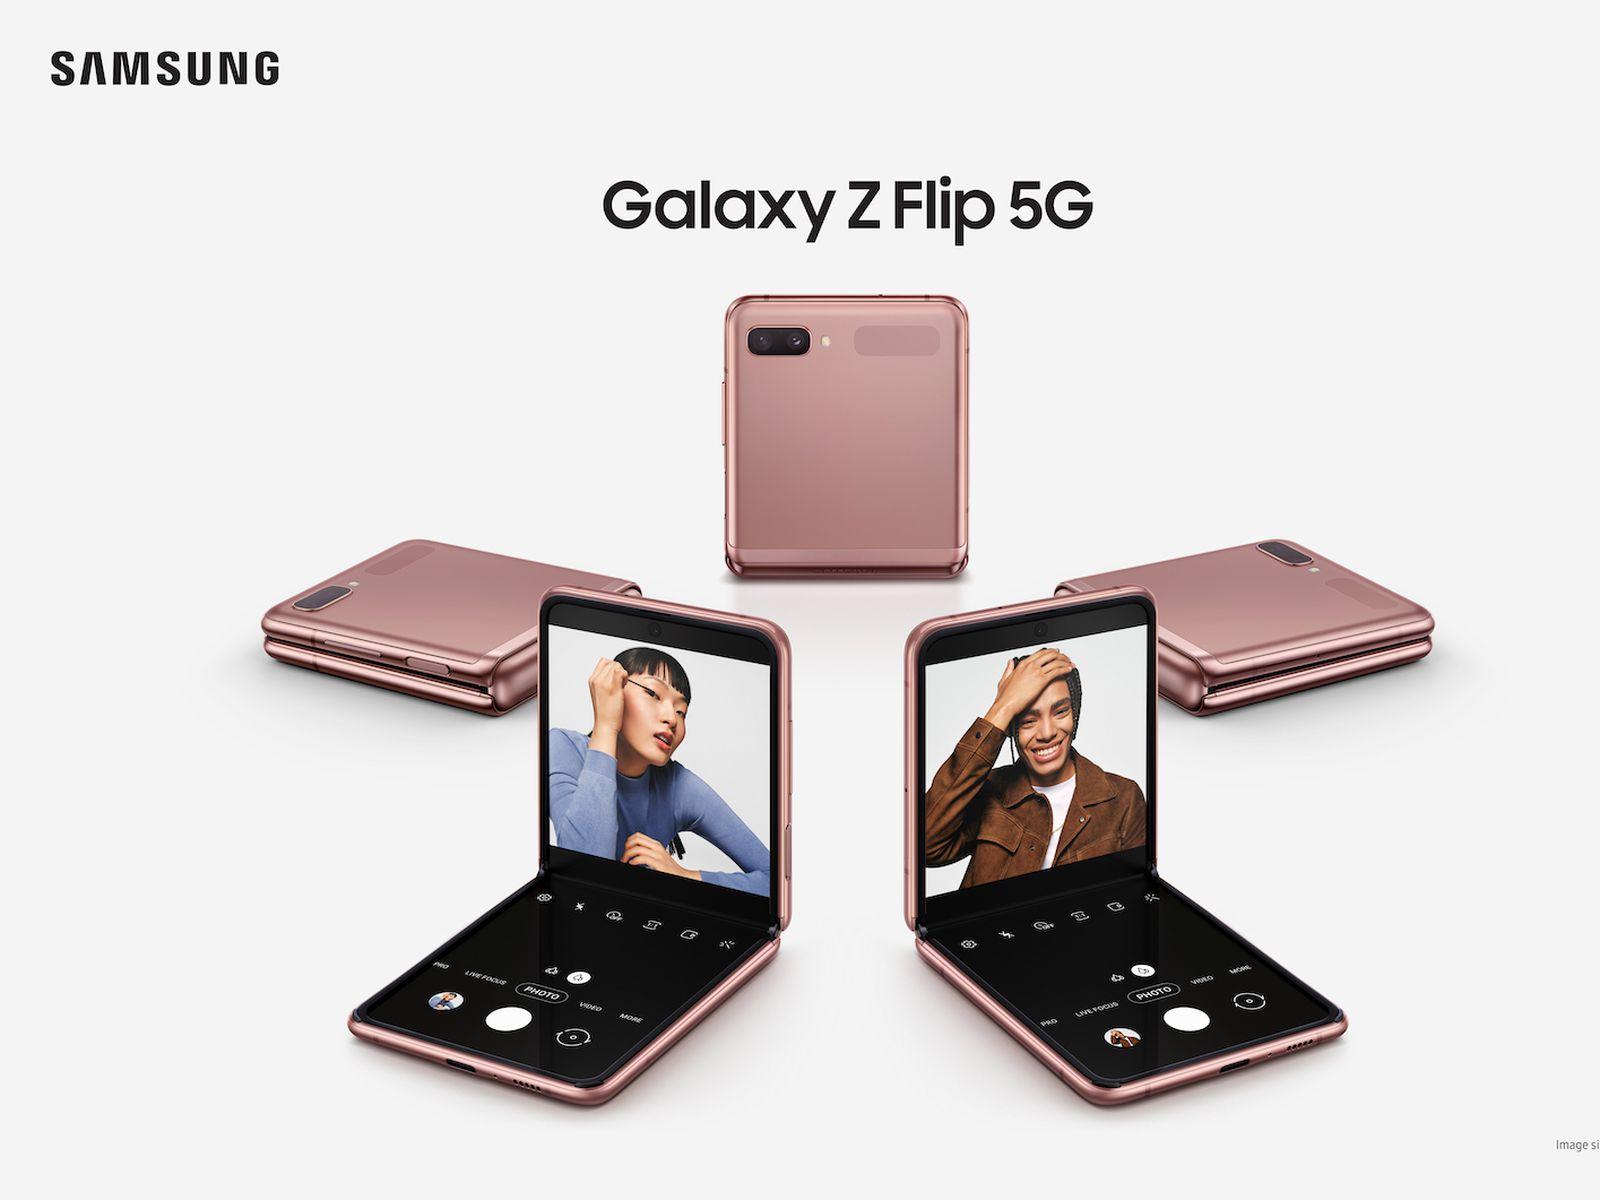 Samsung Announces Galaxy Z Flip 5g Smartphone Starting At 1 449 99 Macrumors